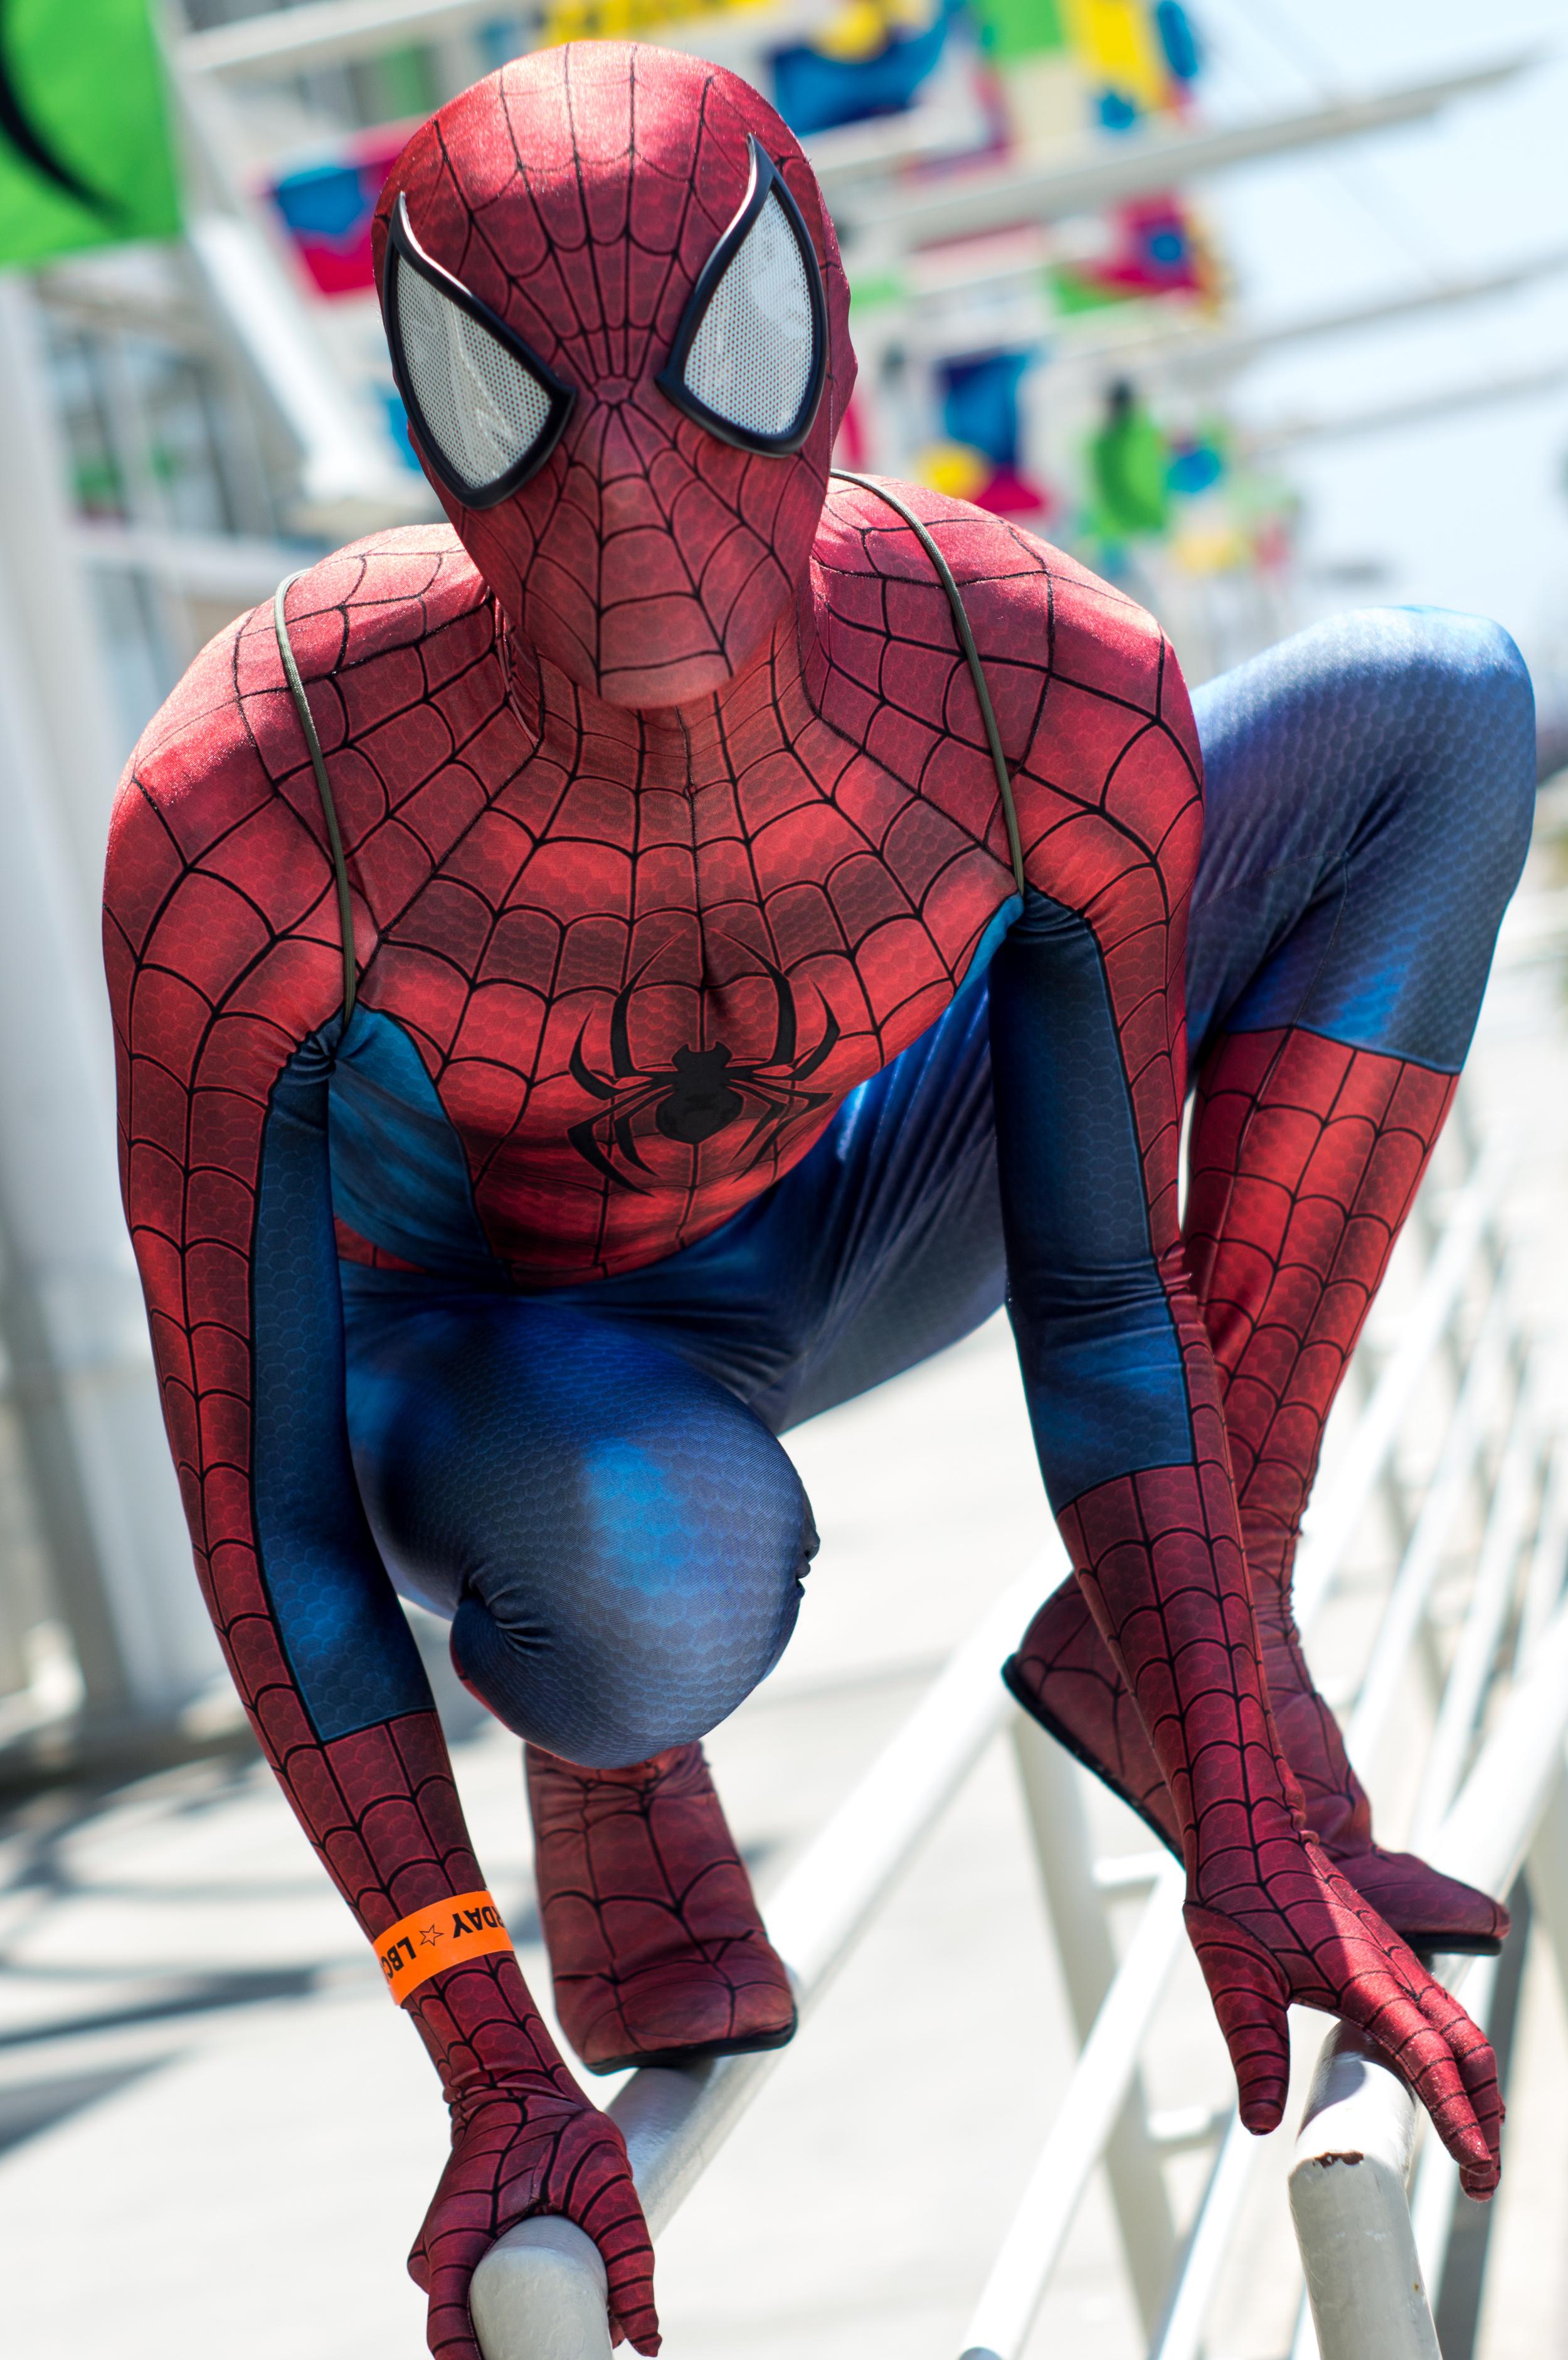 Spiderhero2.jpg